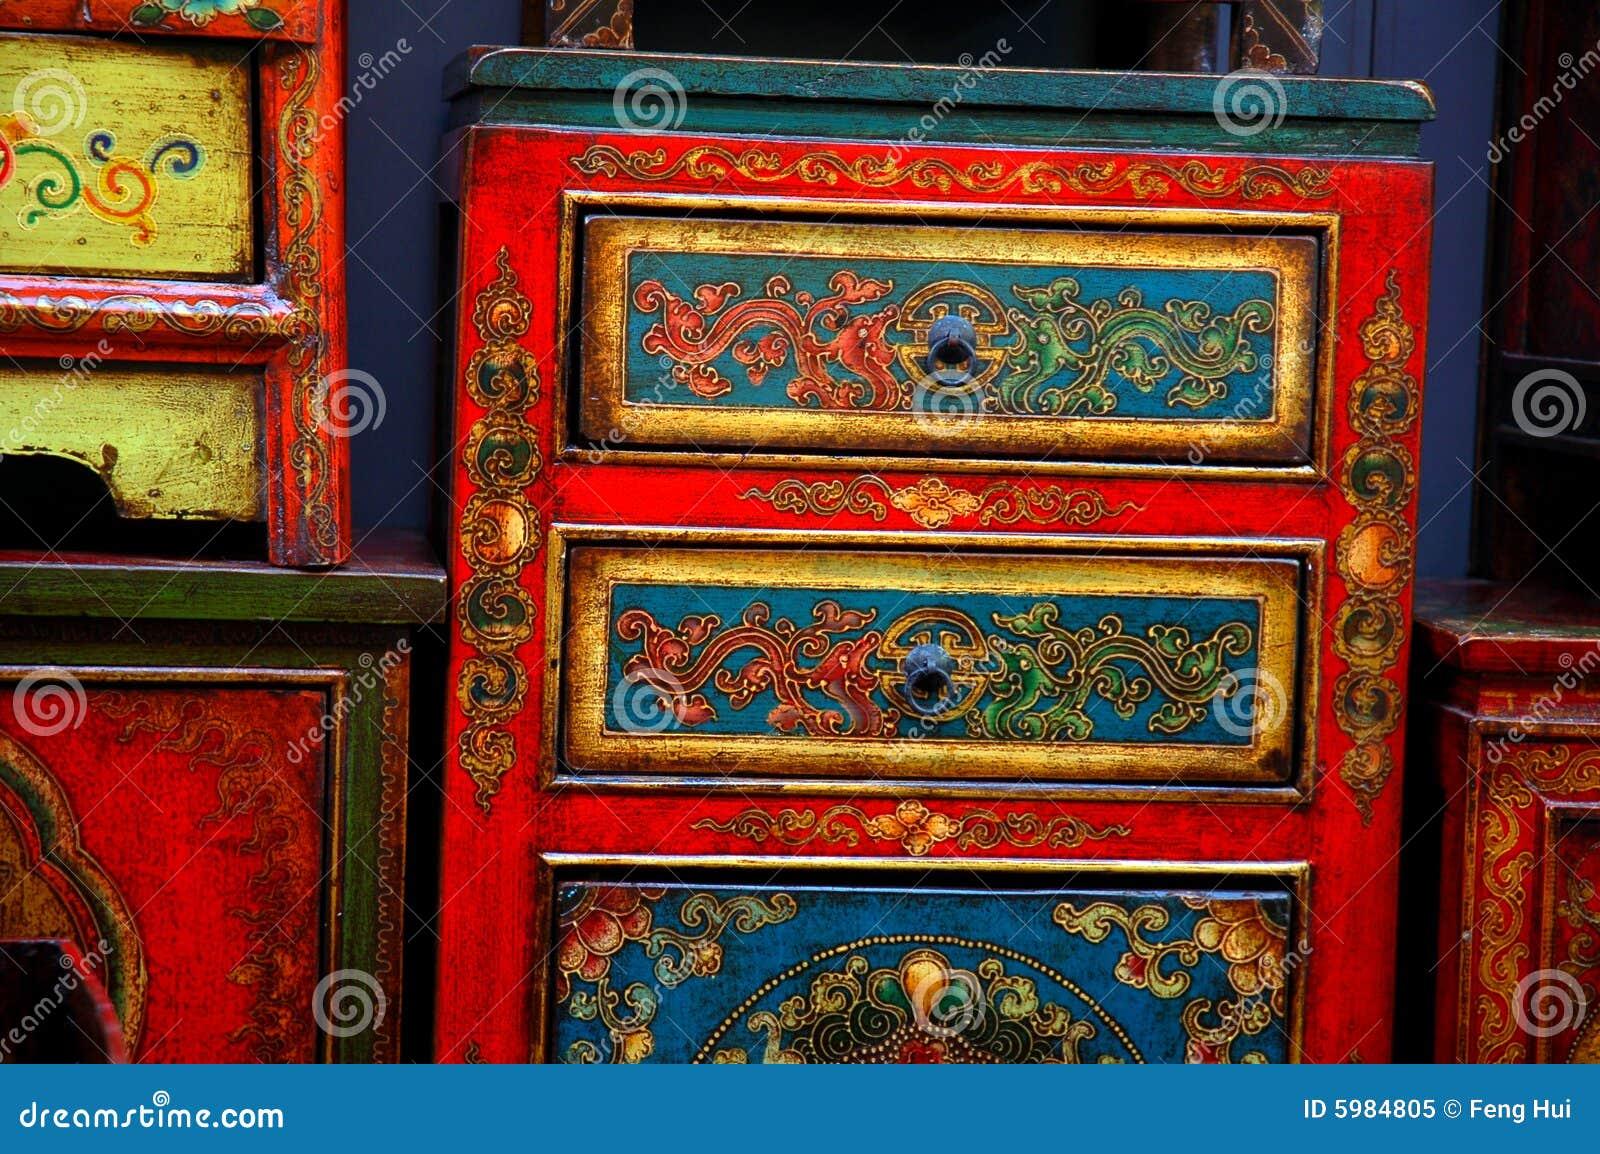 china furniture royalty free stock photo